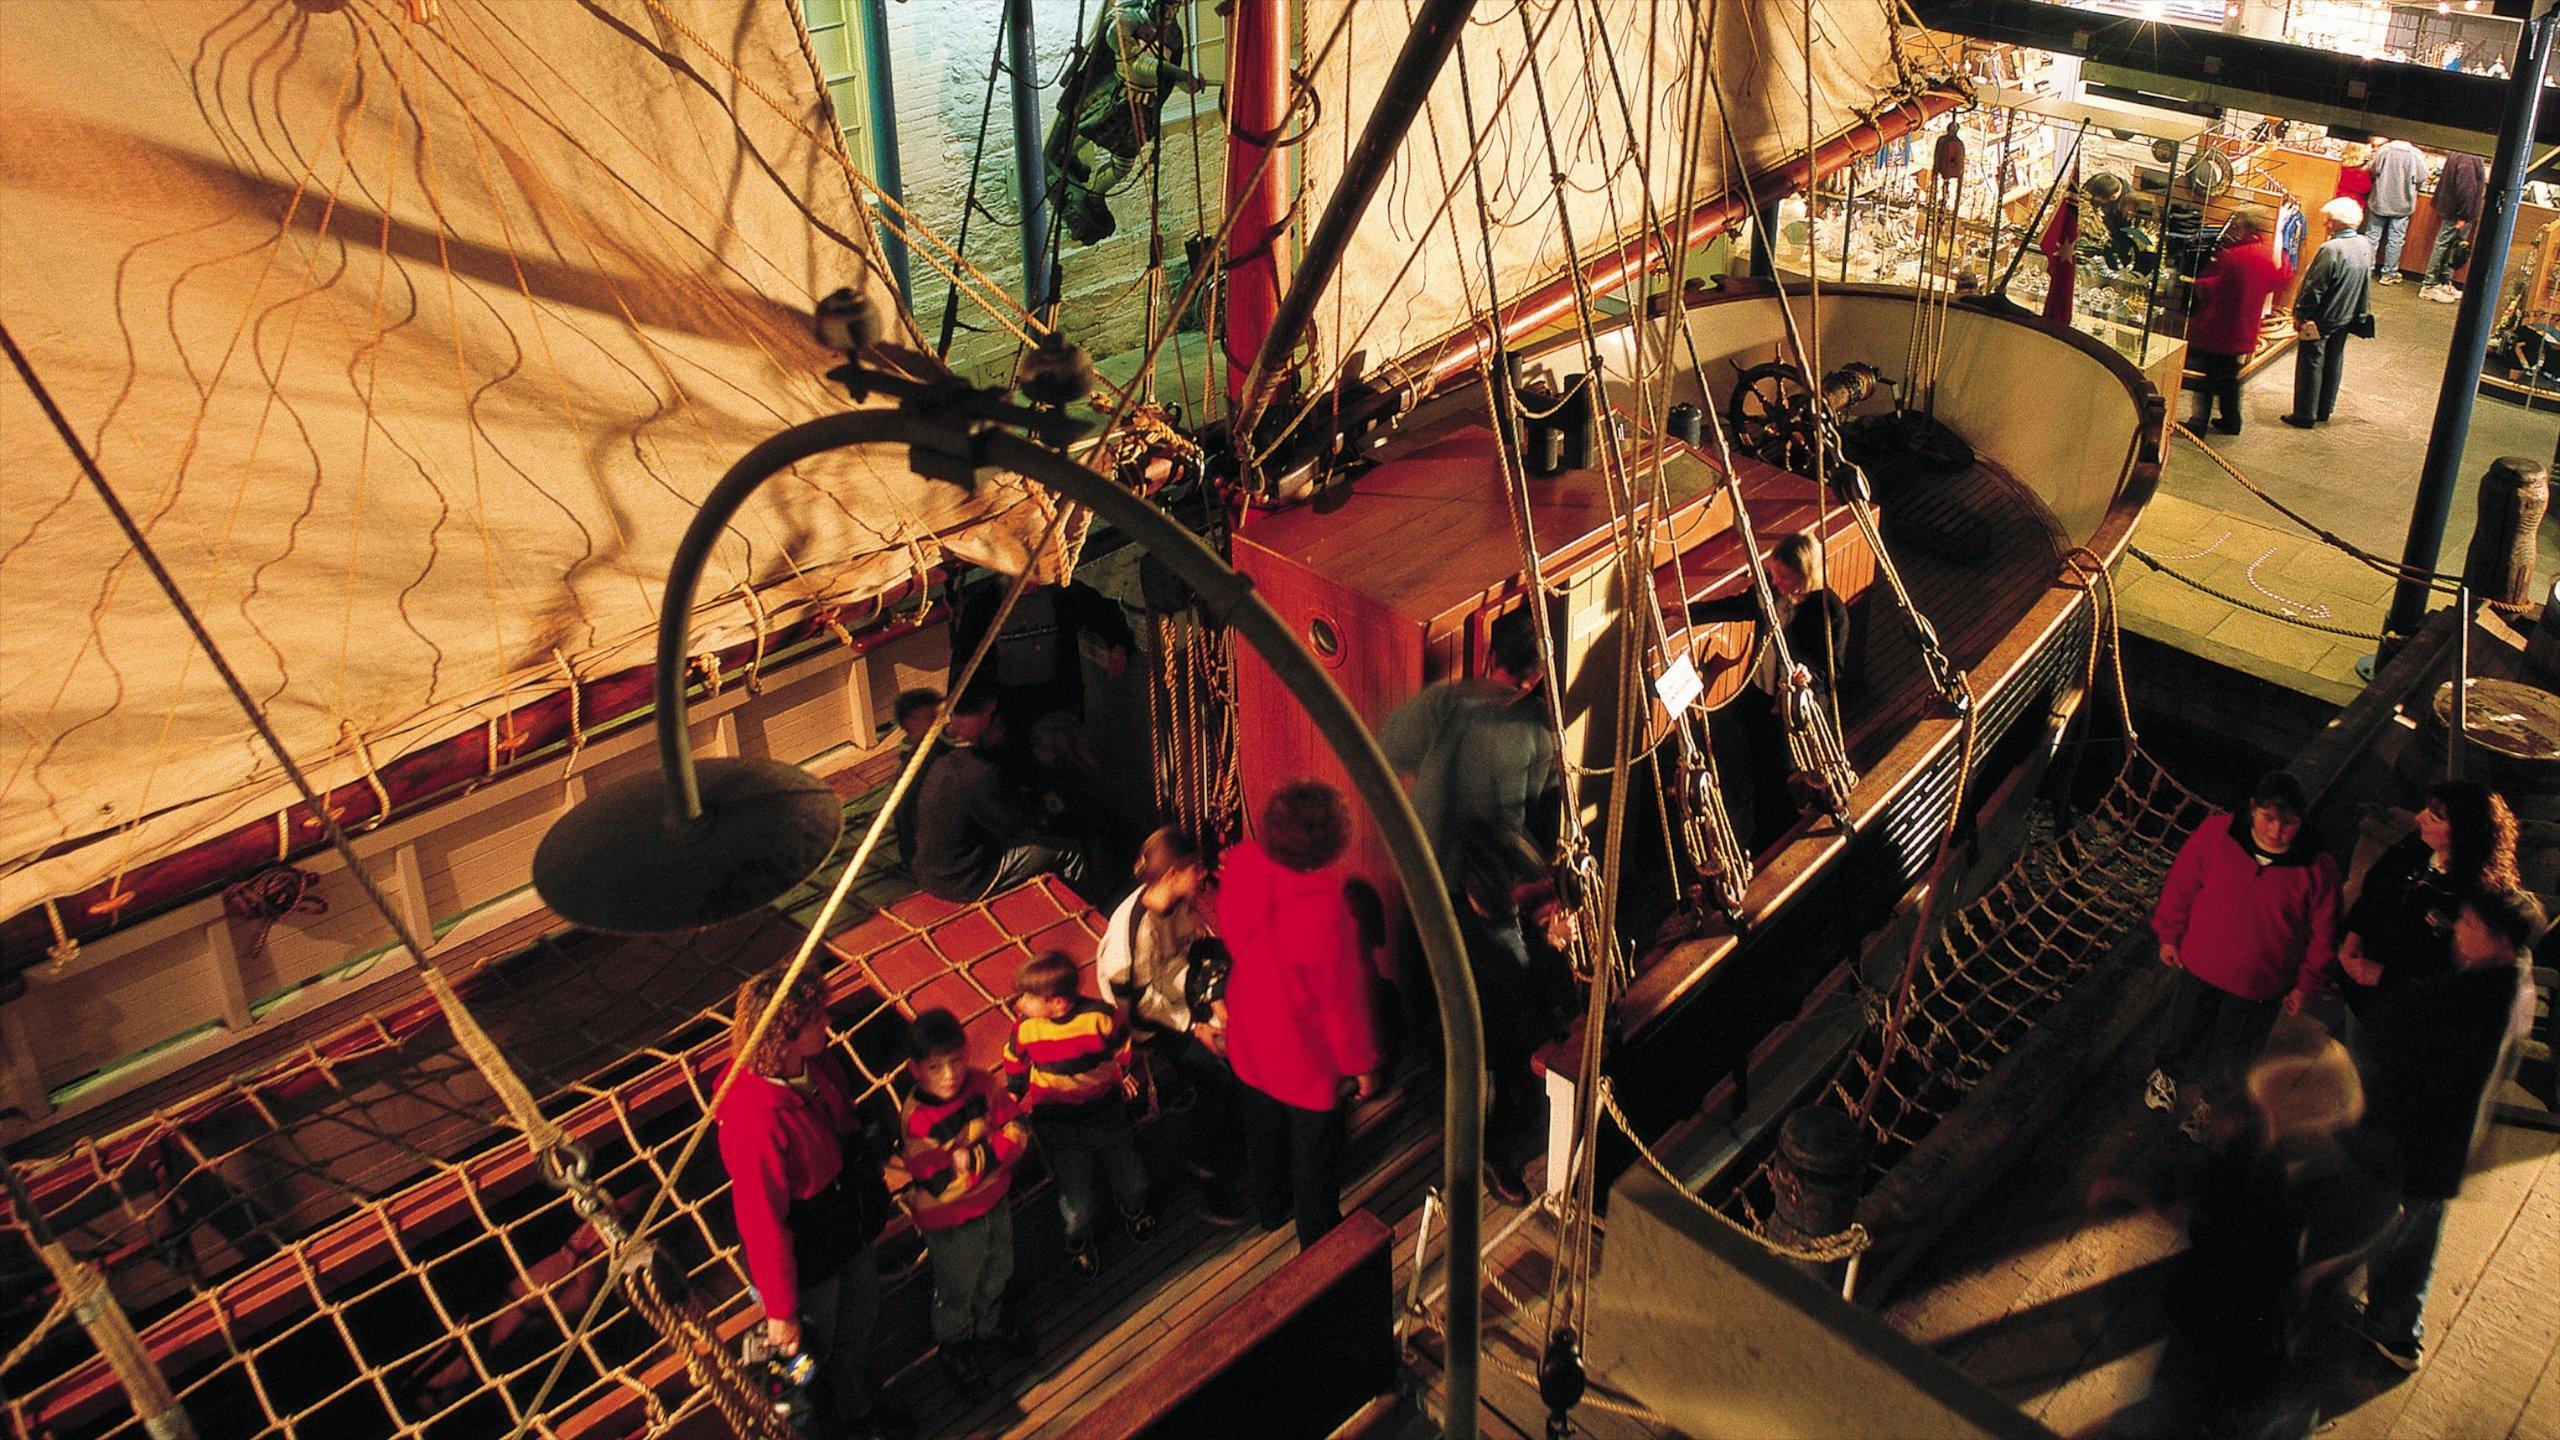 Zuid-Australisch maritiem museum, Adelaide, South Australia, Australië